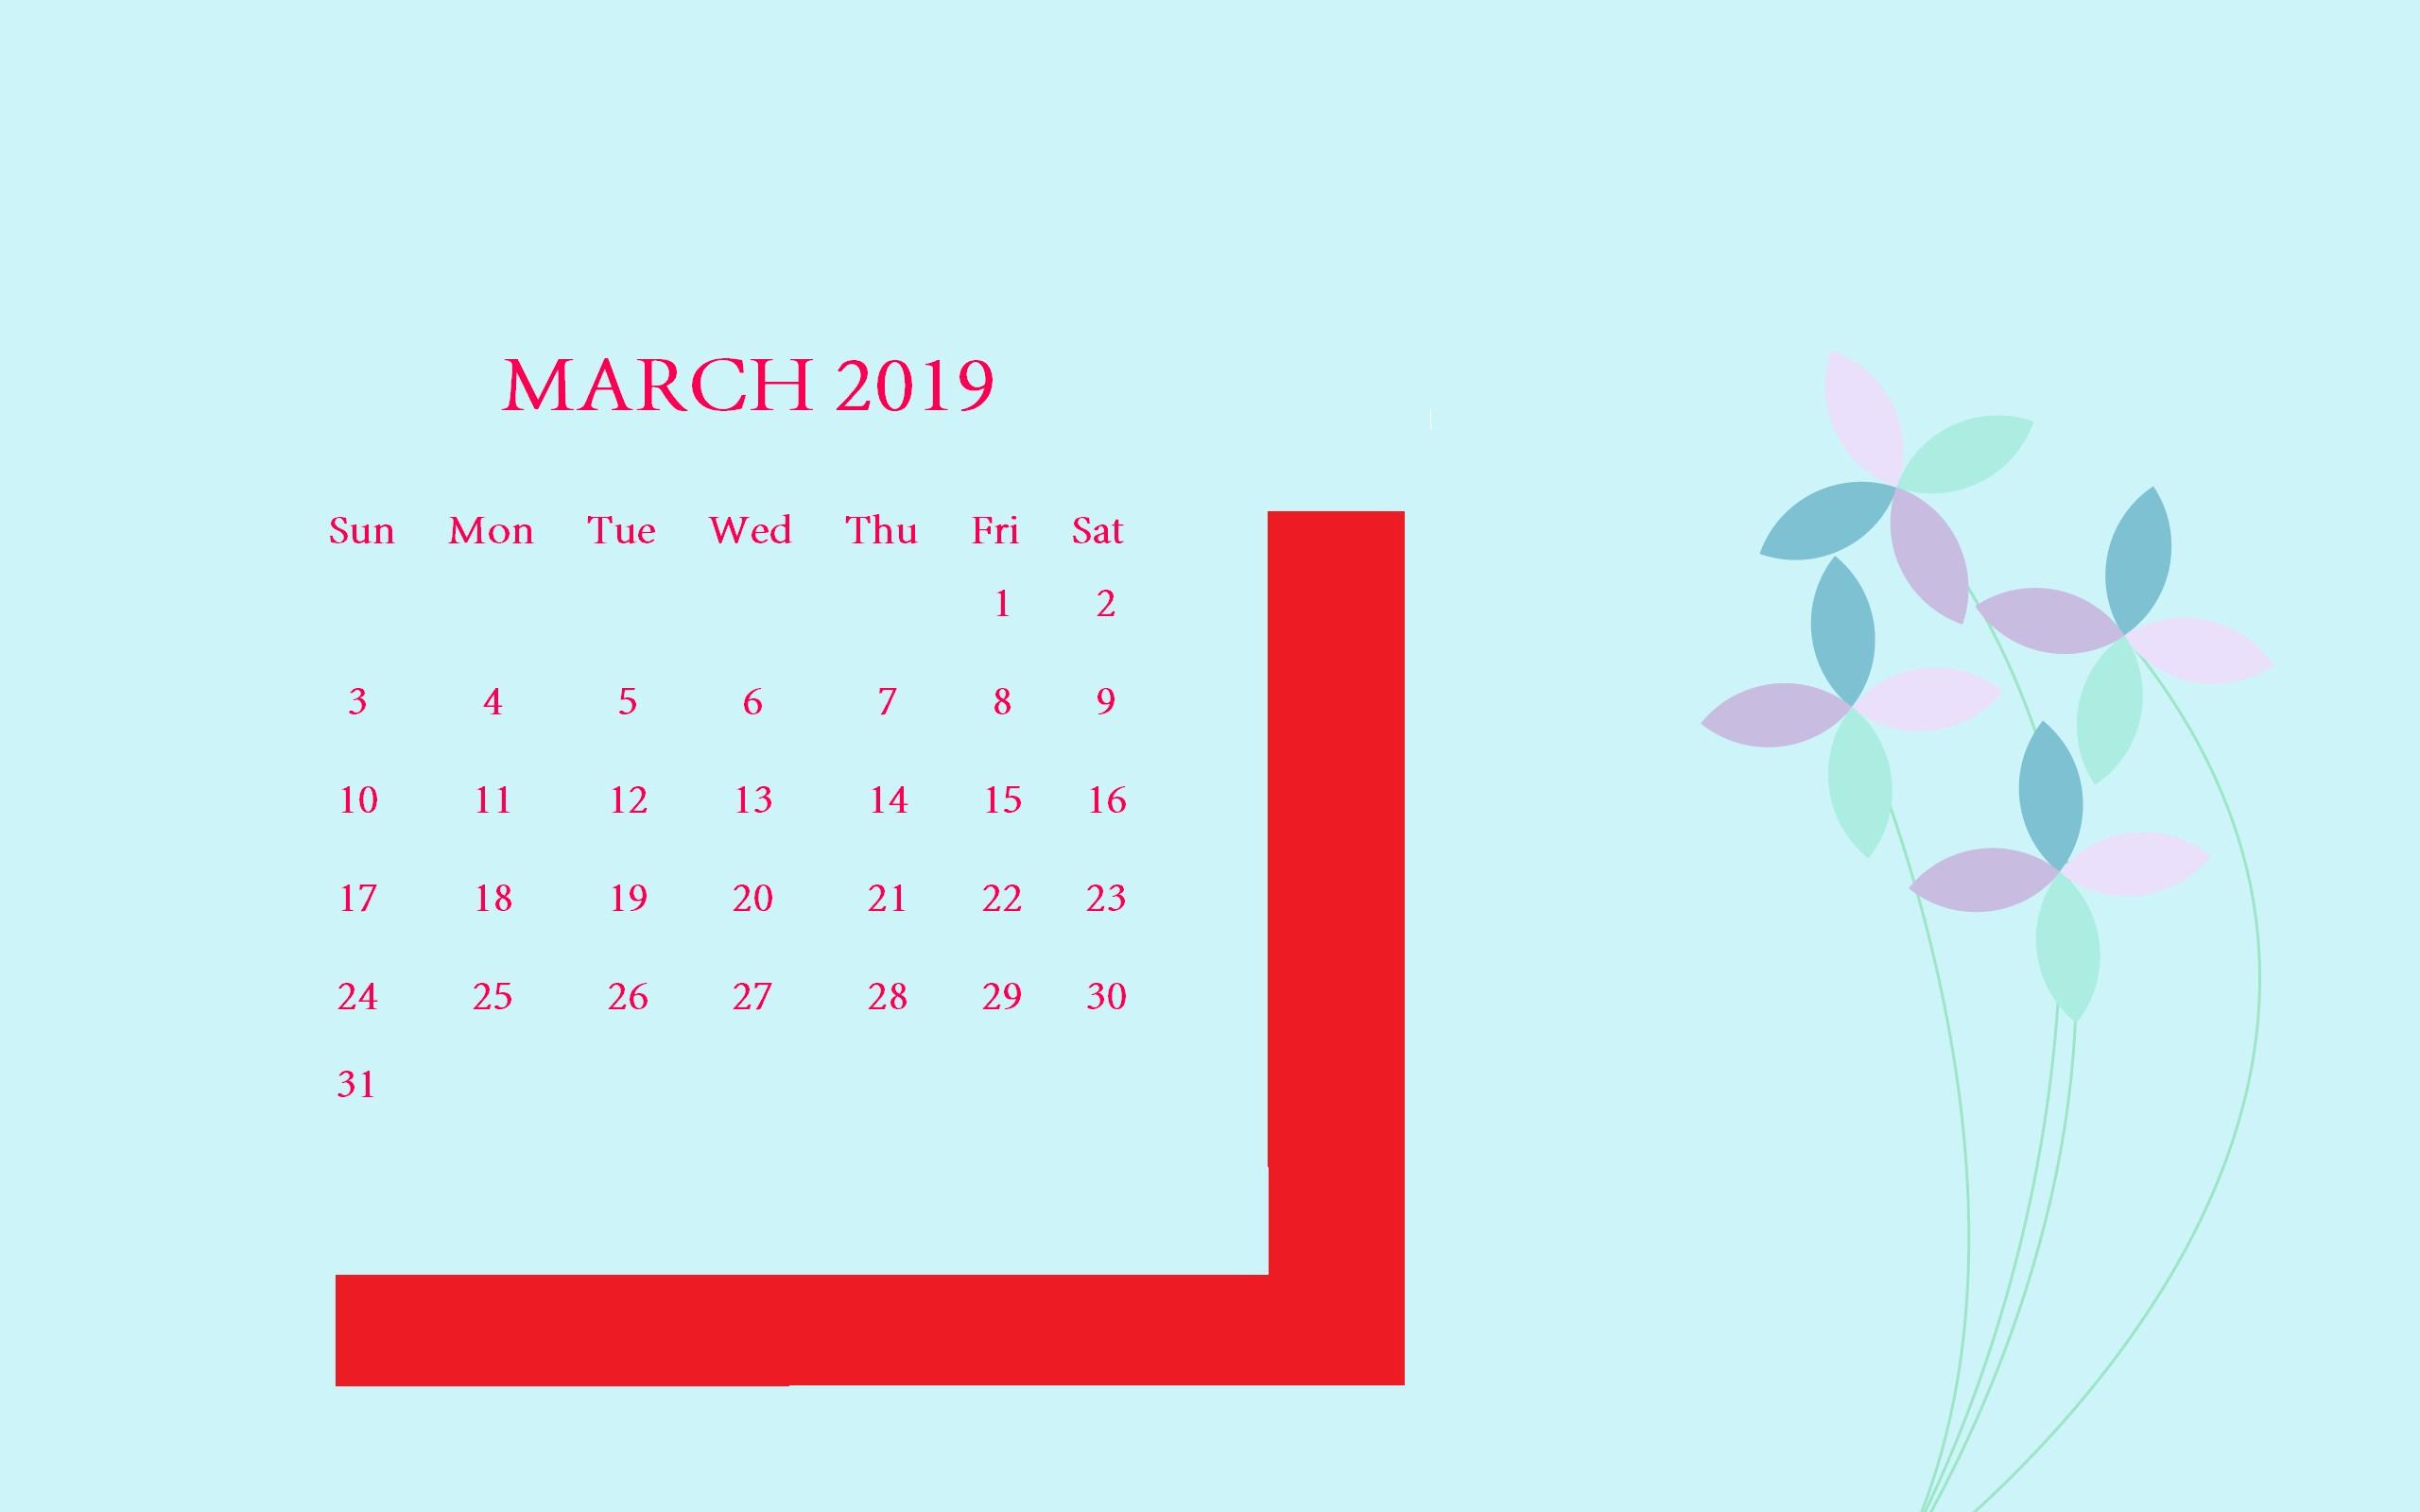 March Calendar Art Más Populares Flowers March 2019 Desktop Calendar March March2019 Of March Calendar Art Más Actual Templates for Powerpoint Swimlane Template Luxury A E A Calendar